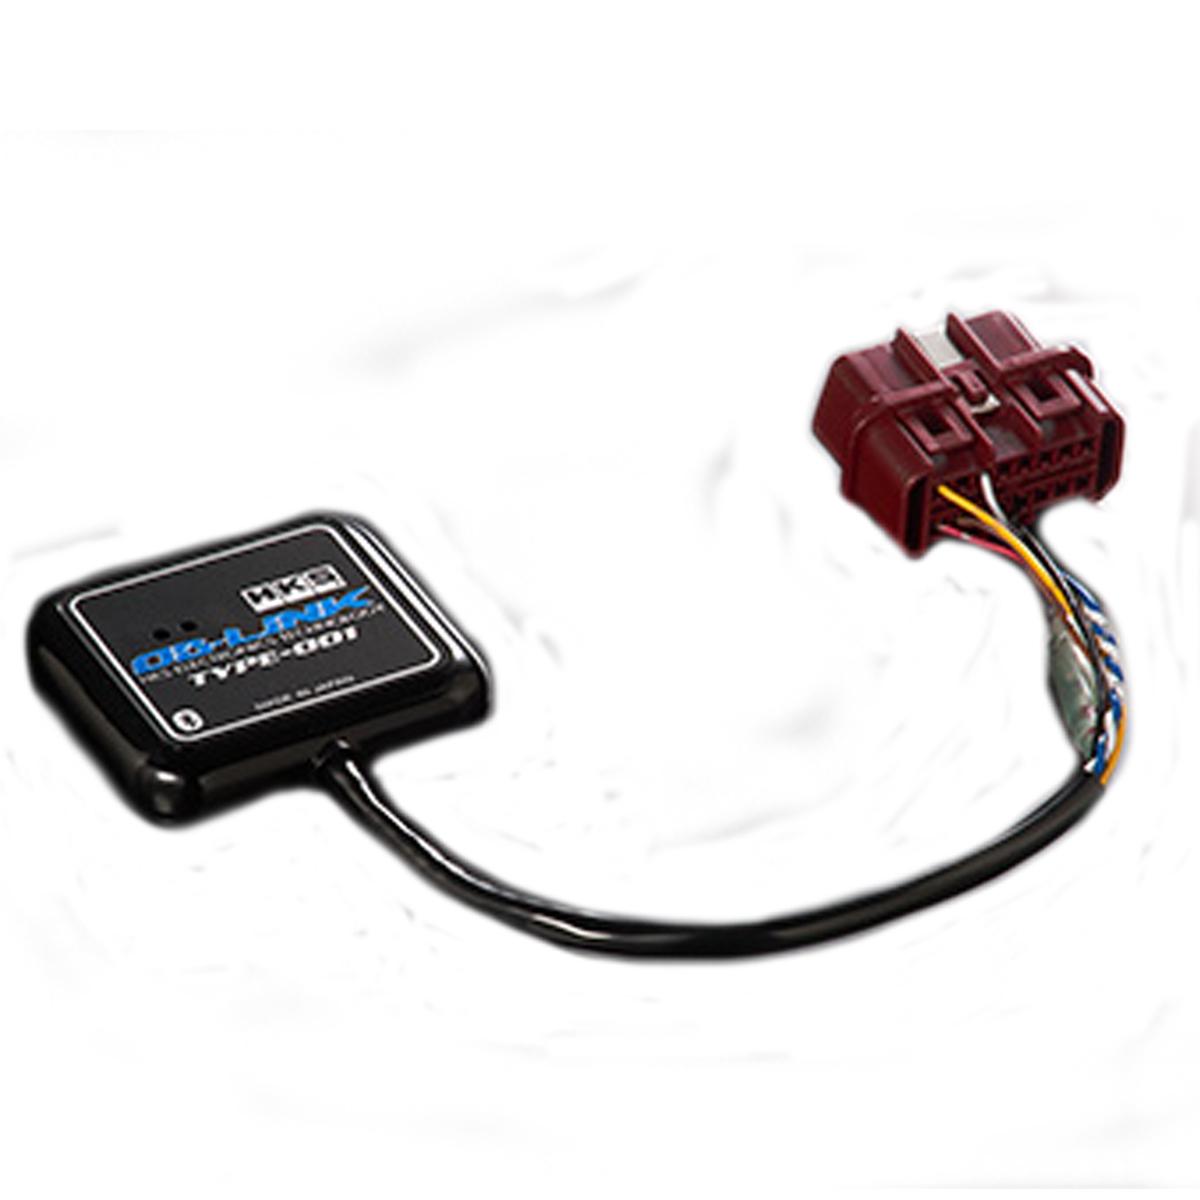 CR-Z 44009-AK002 CR-Z モニター OBリンク タイプ 001 ZF2 HKS 44009-AK002 HKS エレクトリニクス, キサラヅシ:2e81024a --- sunward.msk.ru